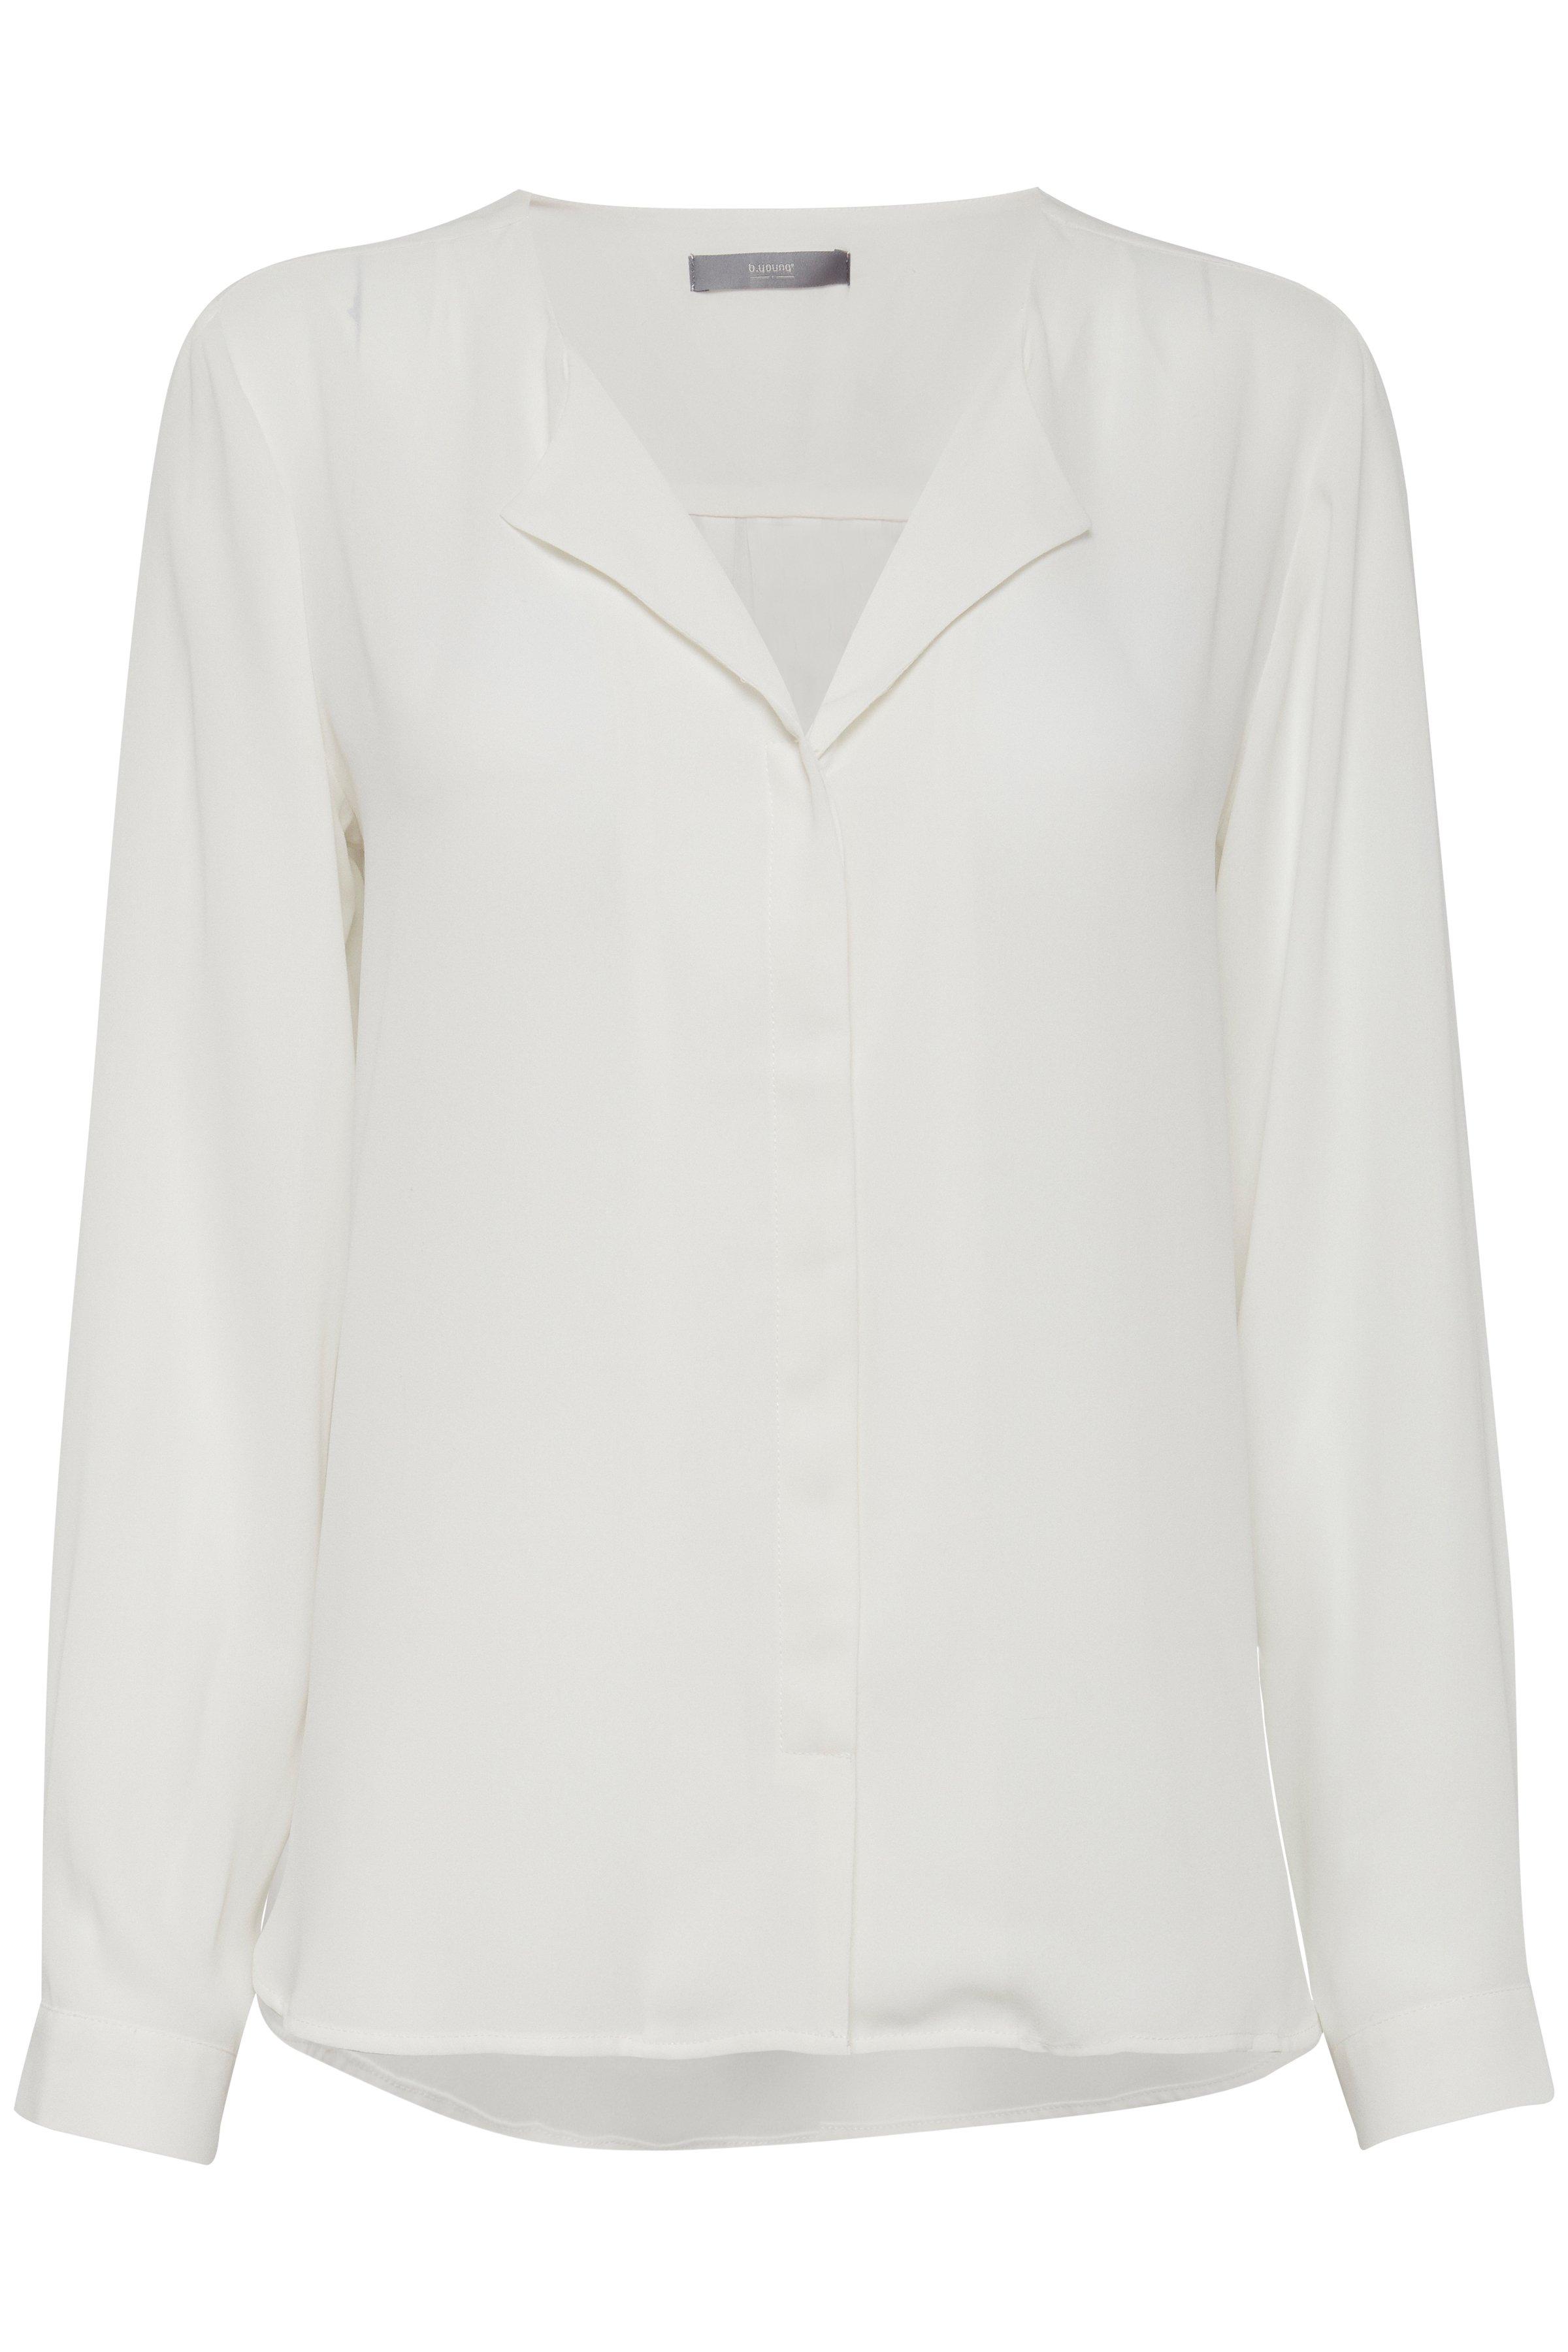 Hialicce skjorte